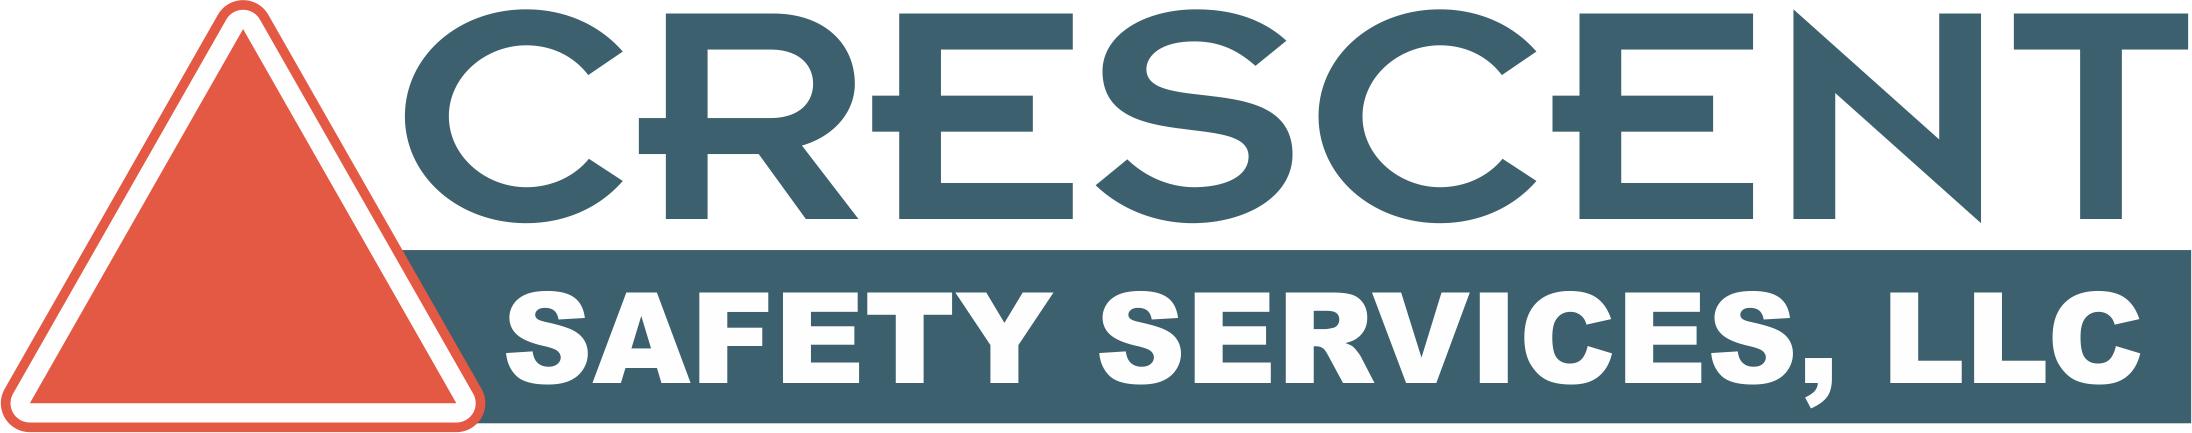 2019 CSS Logo.jpg